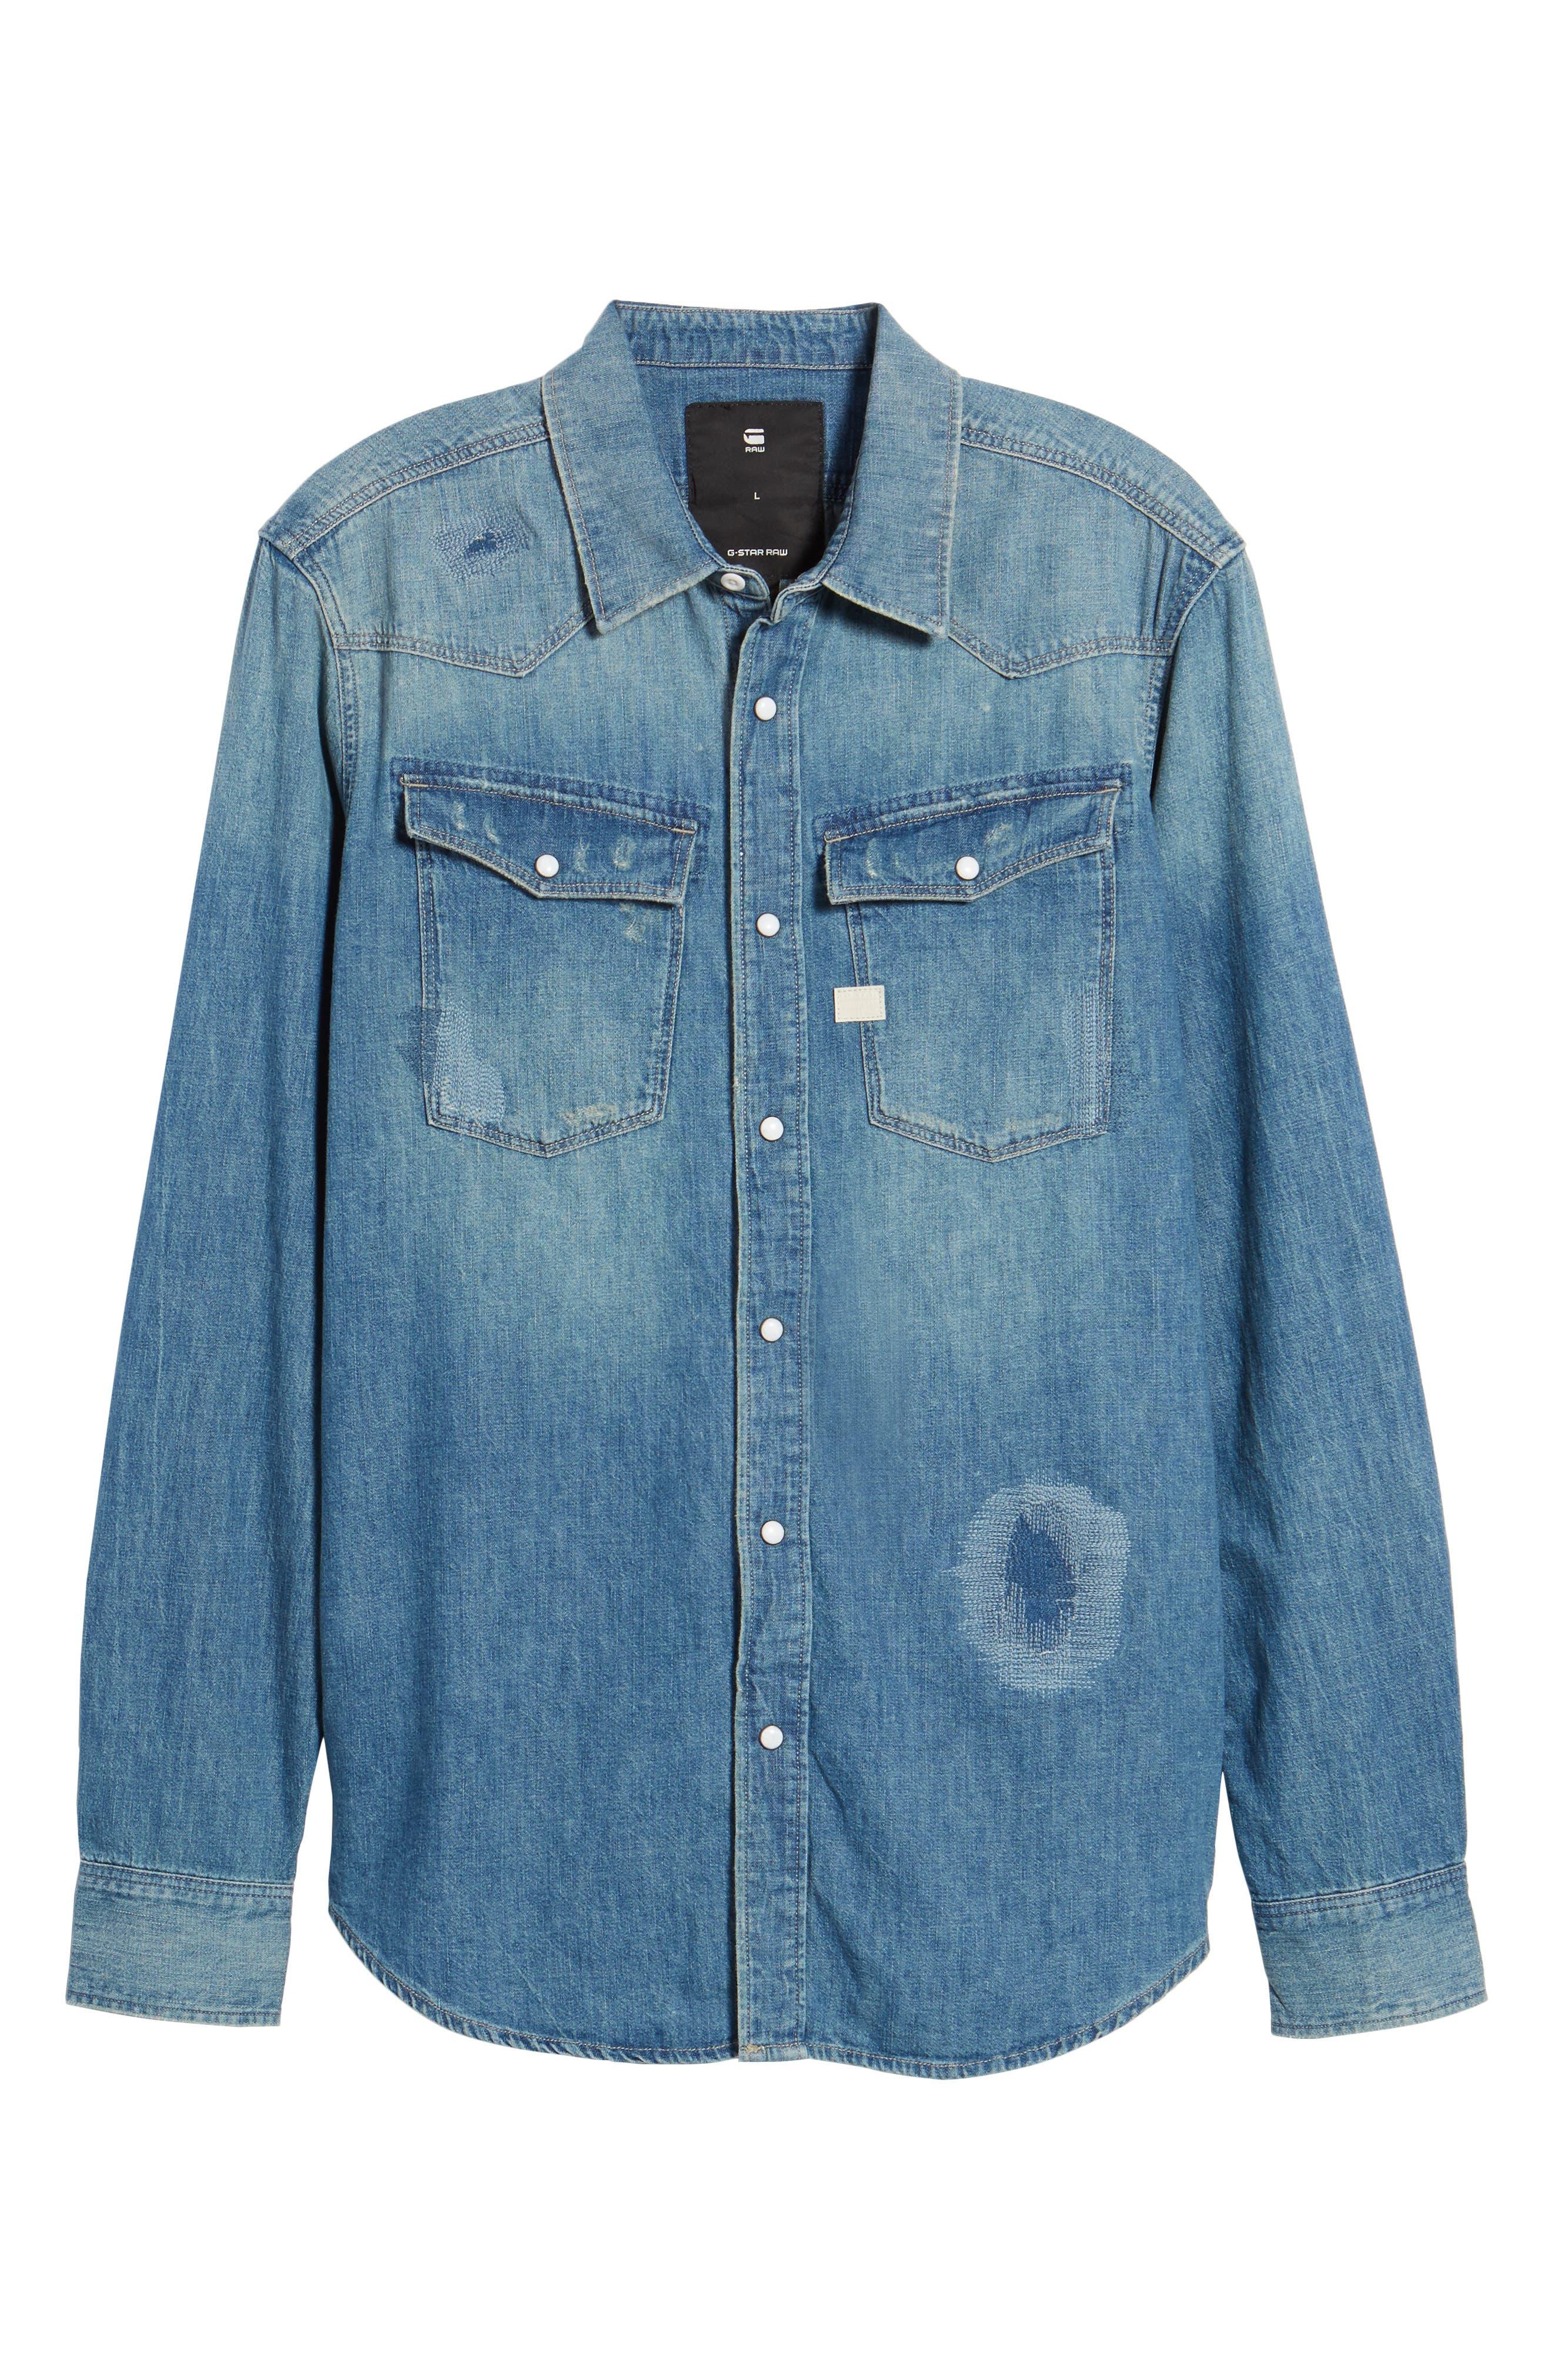 3301 Graft Denim Shirt,                             Alternate thumbnail 6, color,